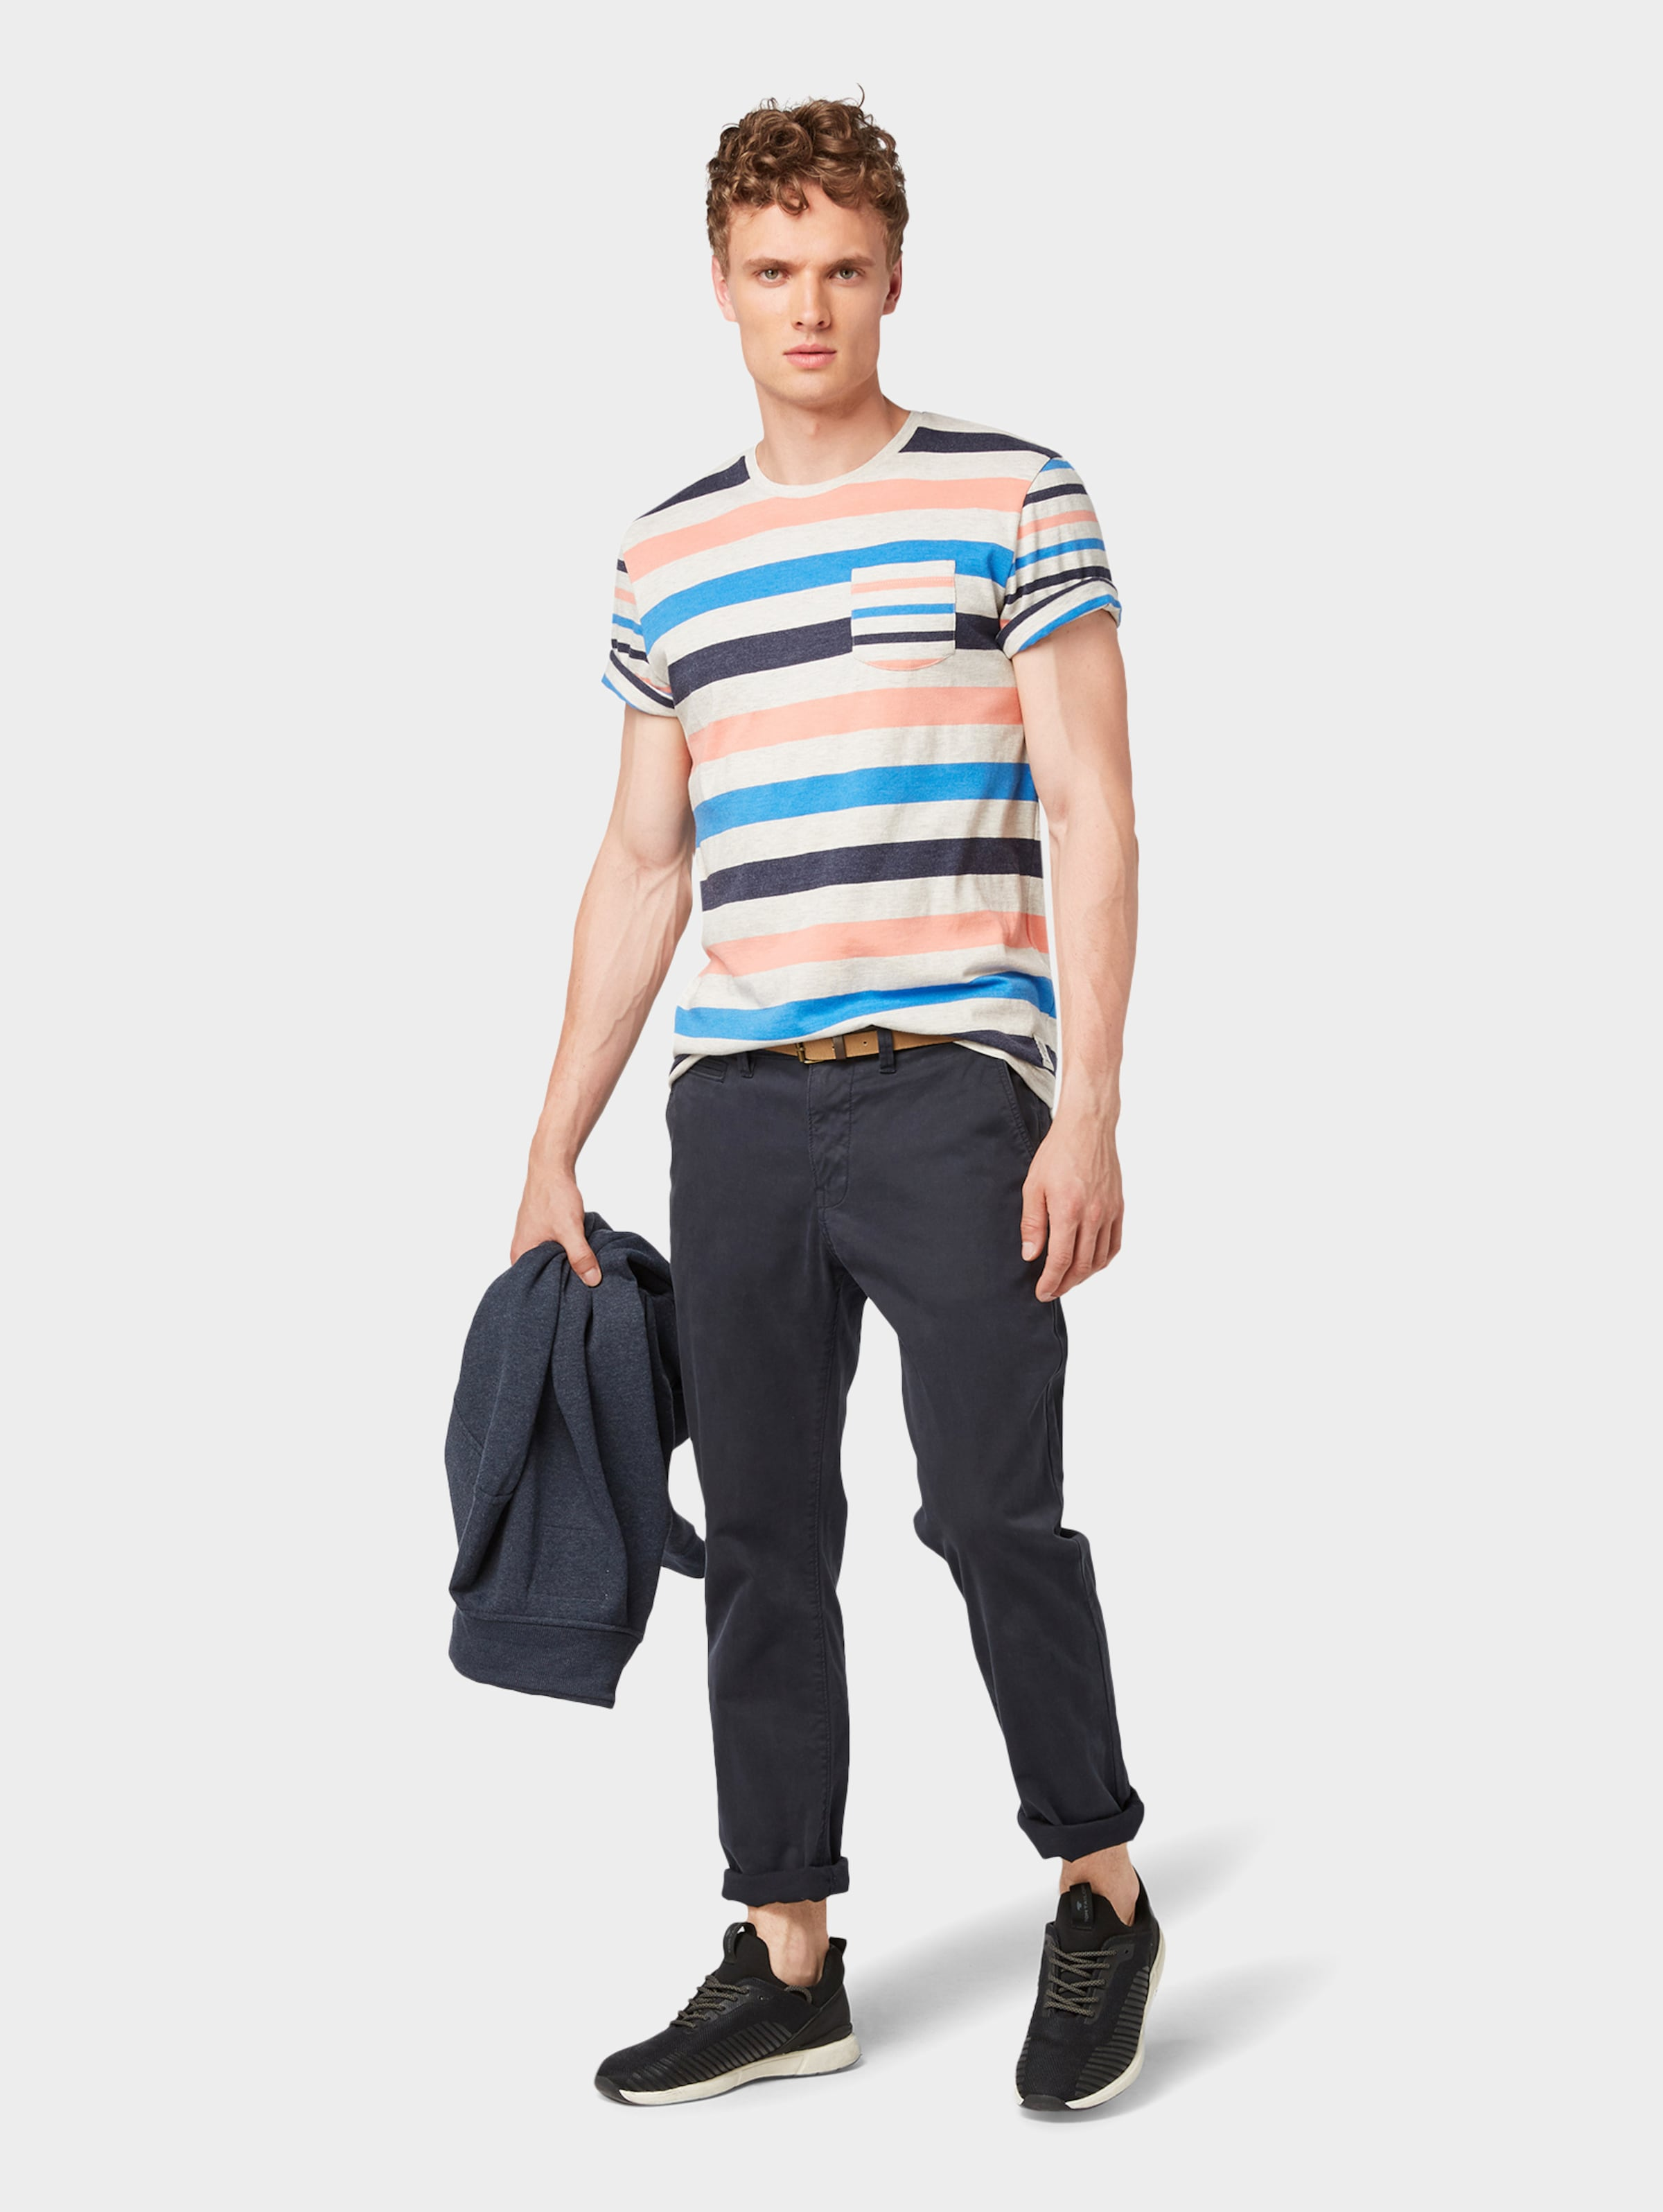 BlauSchwarz Shirt Tom Tailor In Tailor Shirt Tom WI9YDHE2